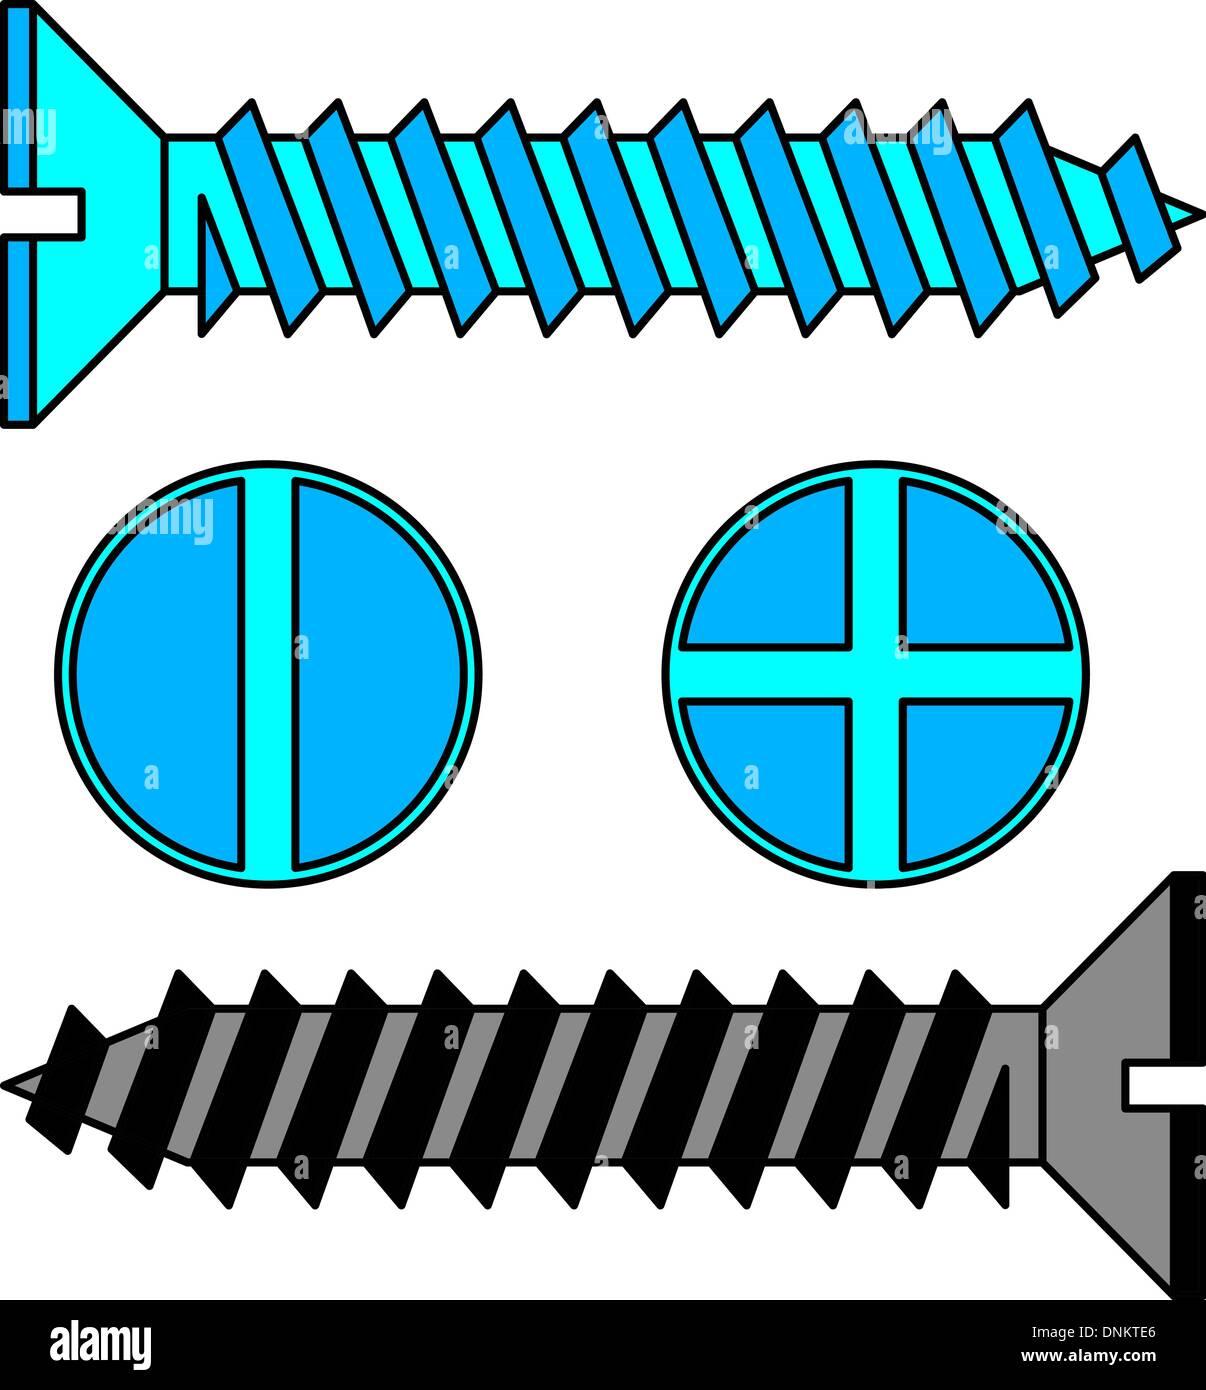 Schraube aus rostfreiem Stahl. Vektor-Illustration. Stockbild